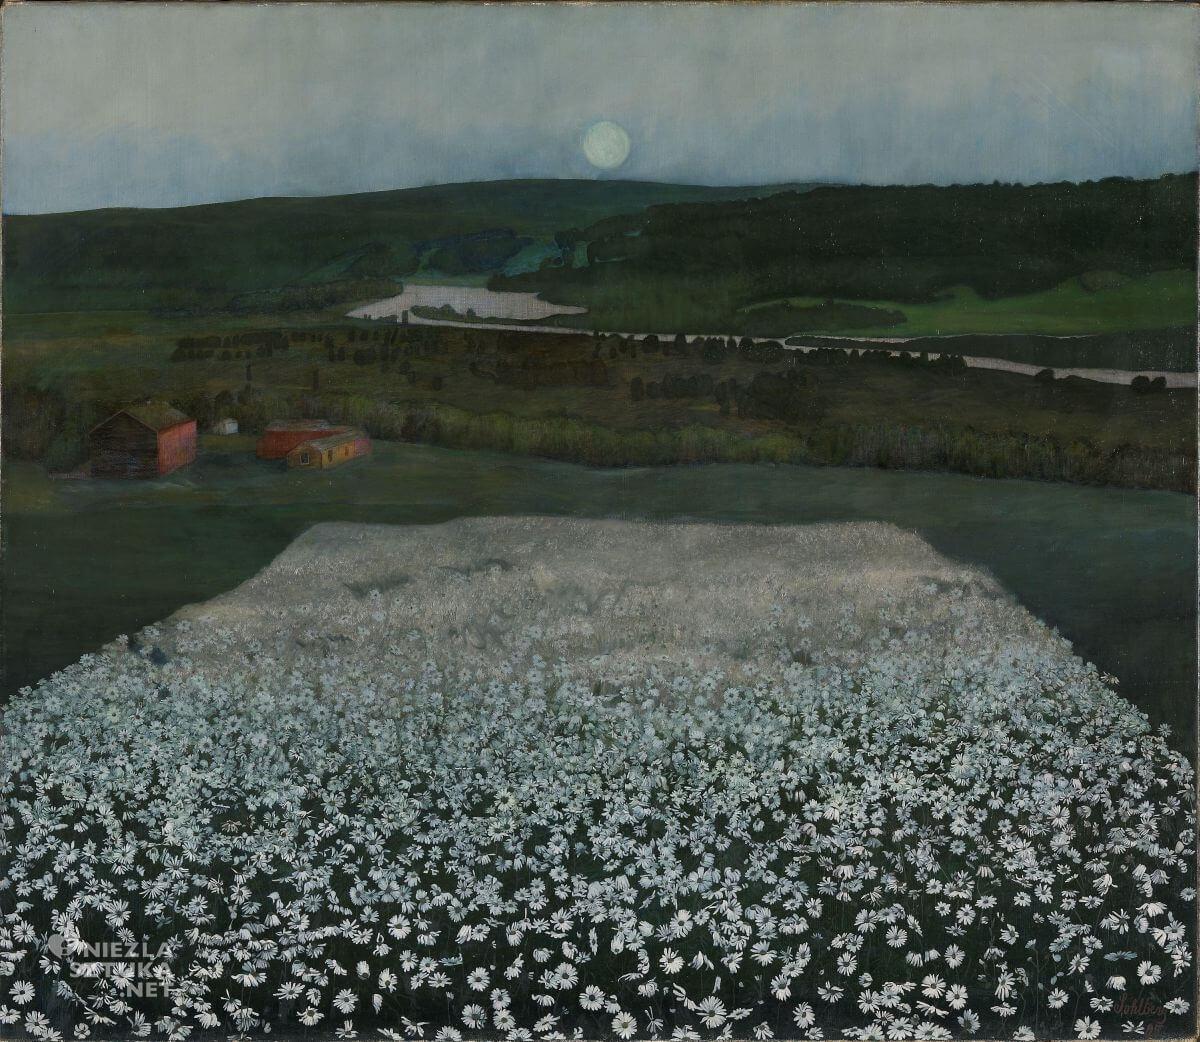 Harald Sohlberg, Kwietna łąka na północy, sztuka skandynawska, Niezła sztuka